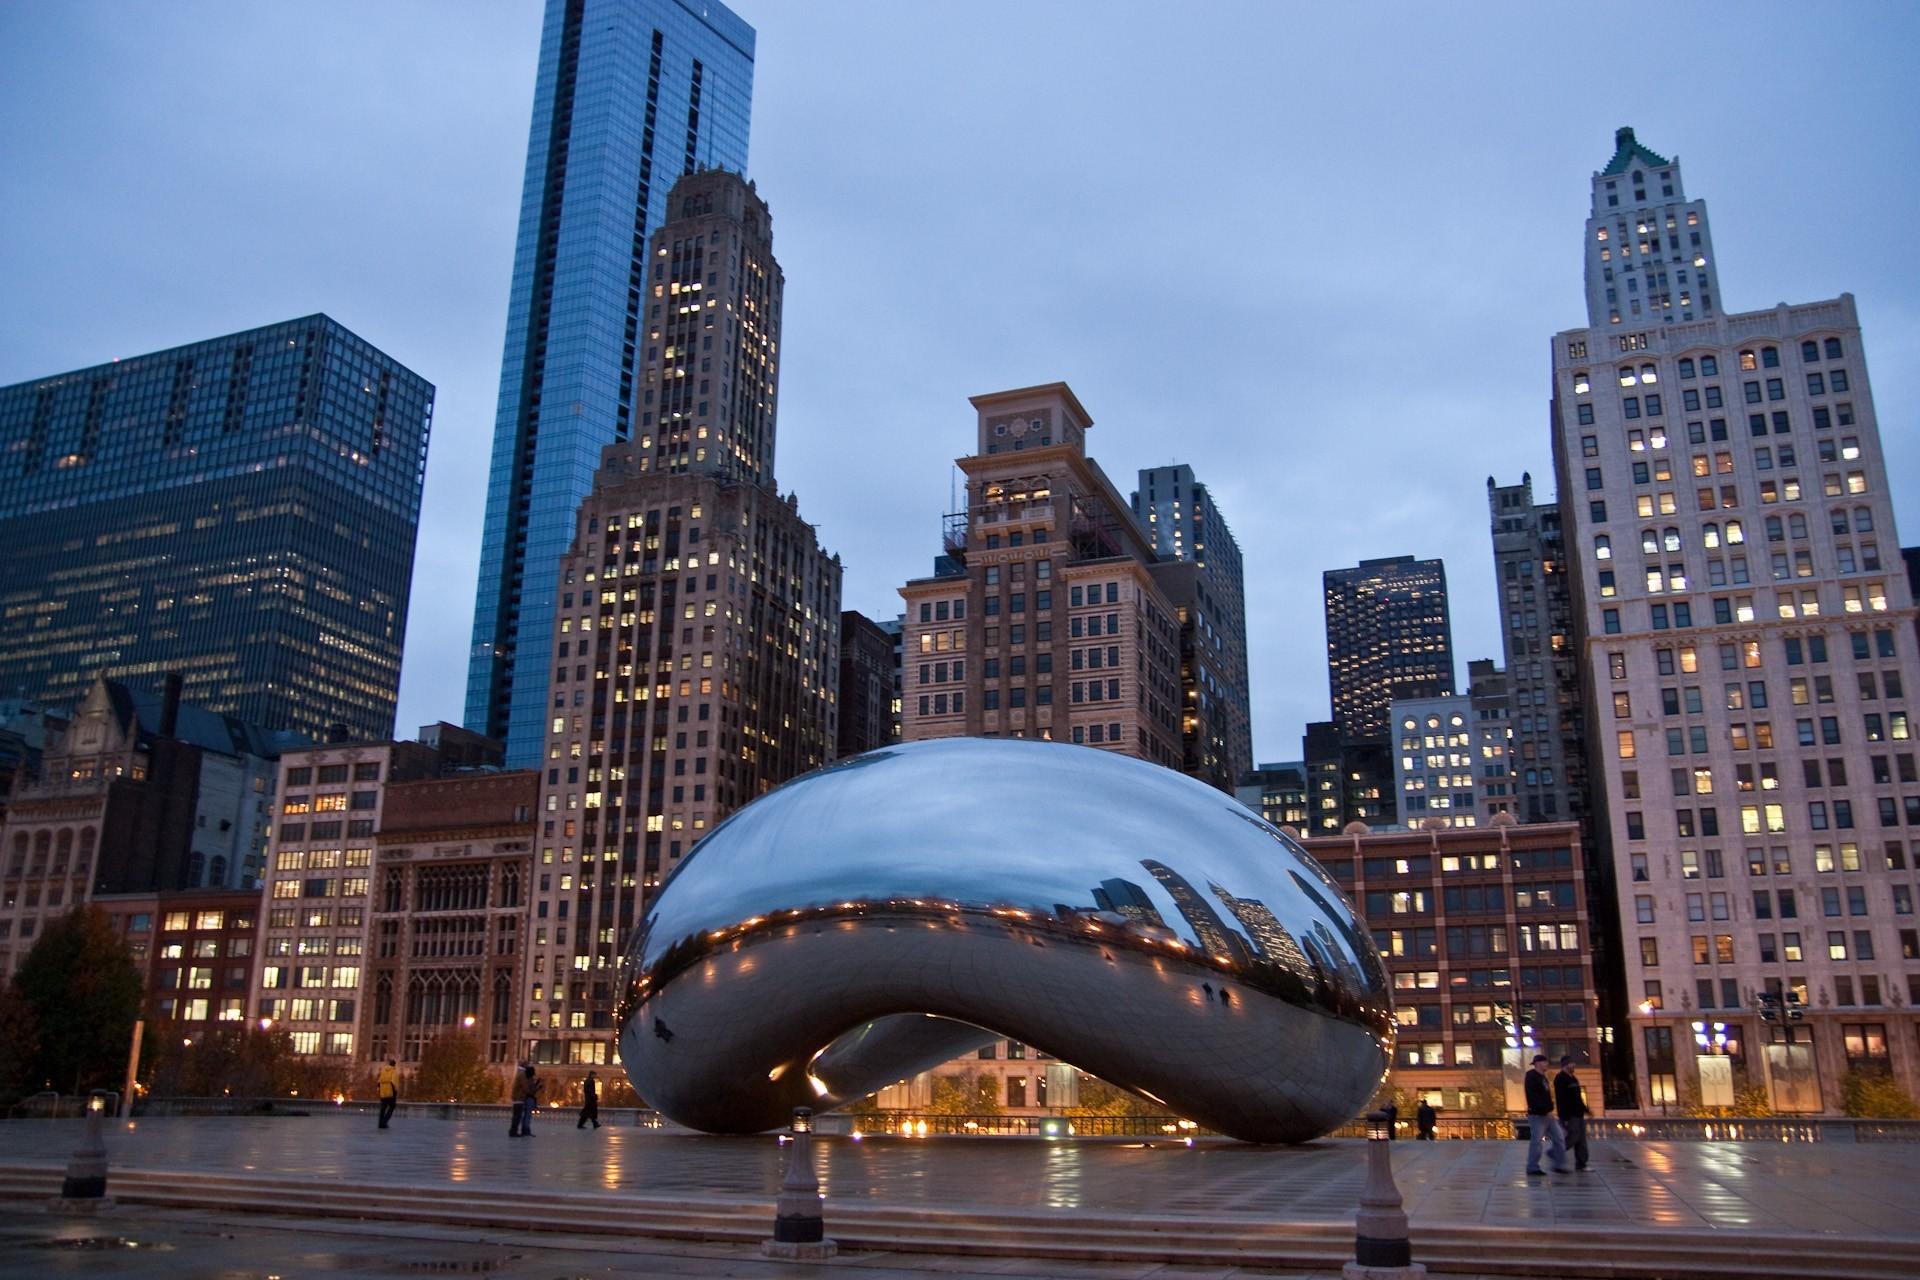 chicago-bean-cityscapes-sculptures-1920x1280-wallpaper